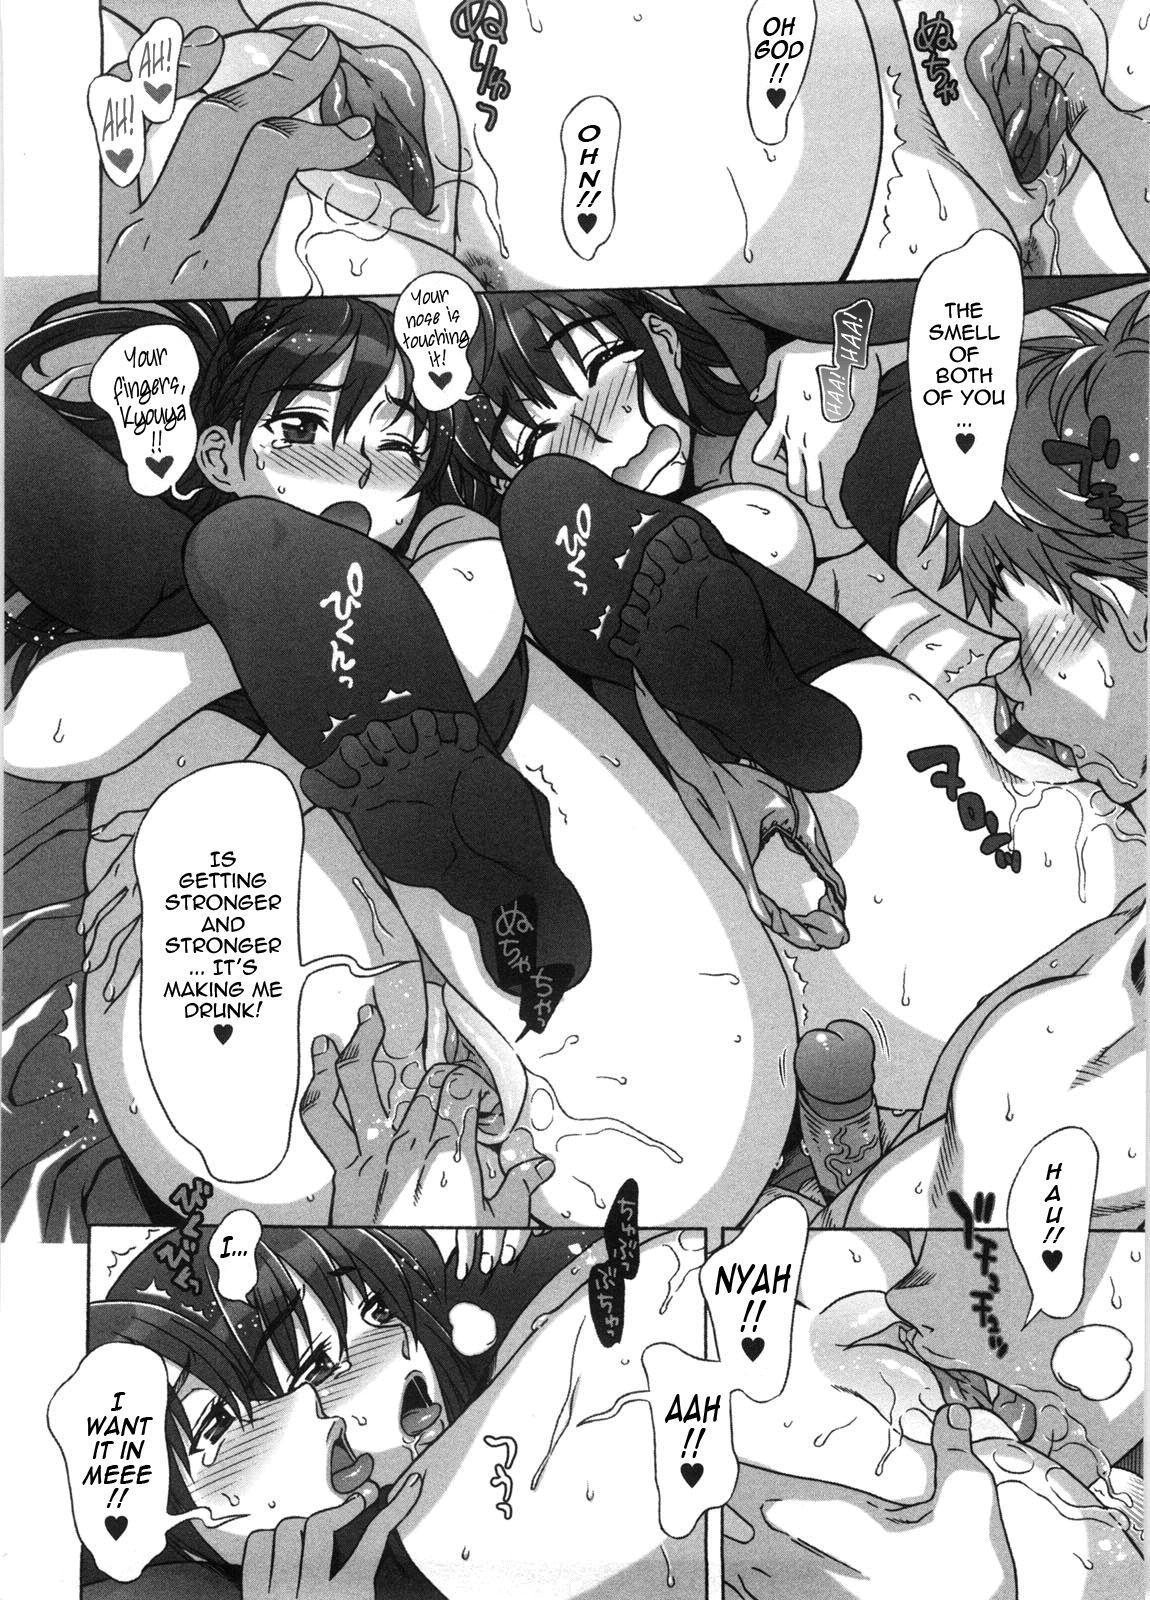 [Hanzaki Jirou] Ama Ero - Sweet Sugar Baby Ch. 1-3 [English] [Tadanohito] [Decensored] 11